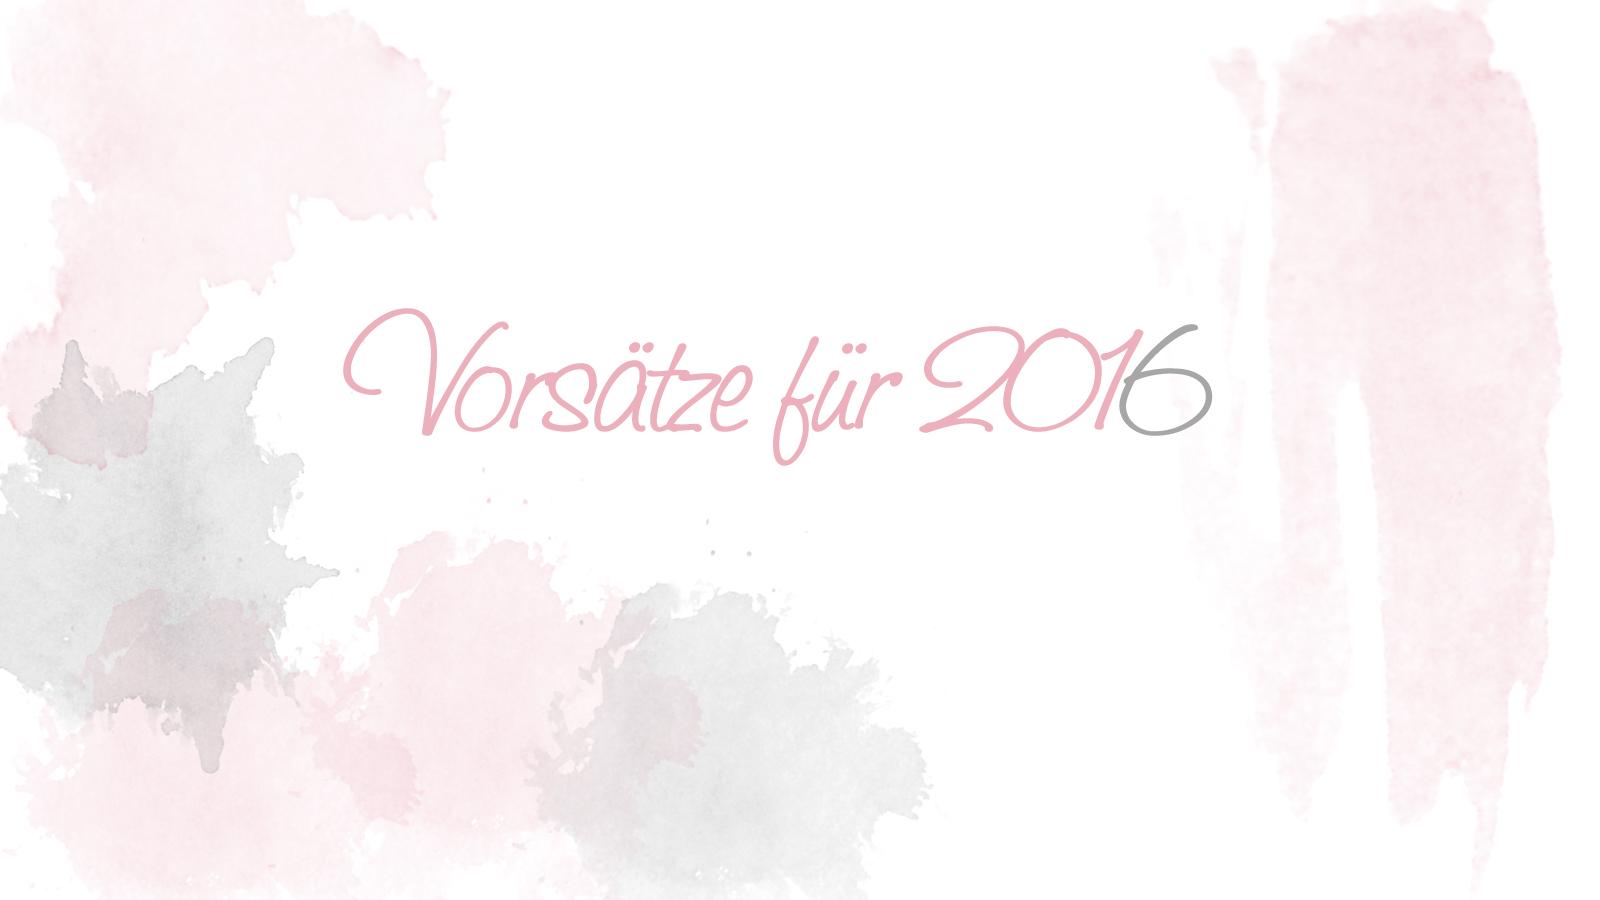 Vorsätze für 2016 Image